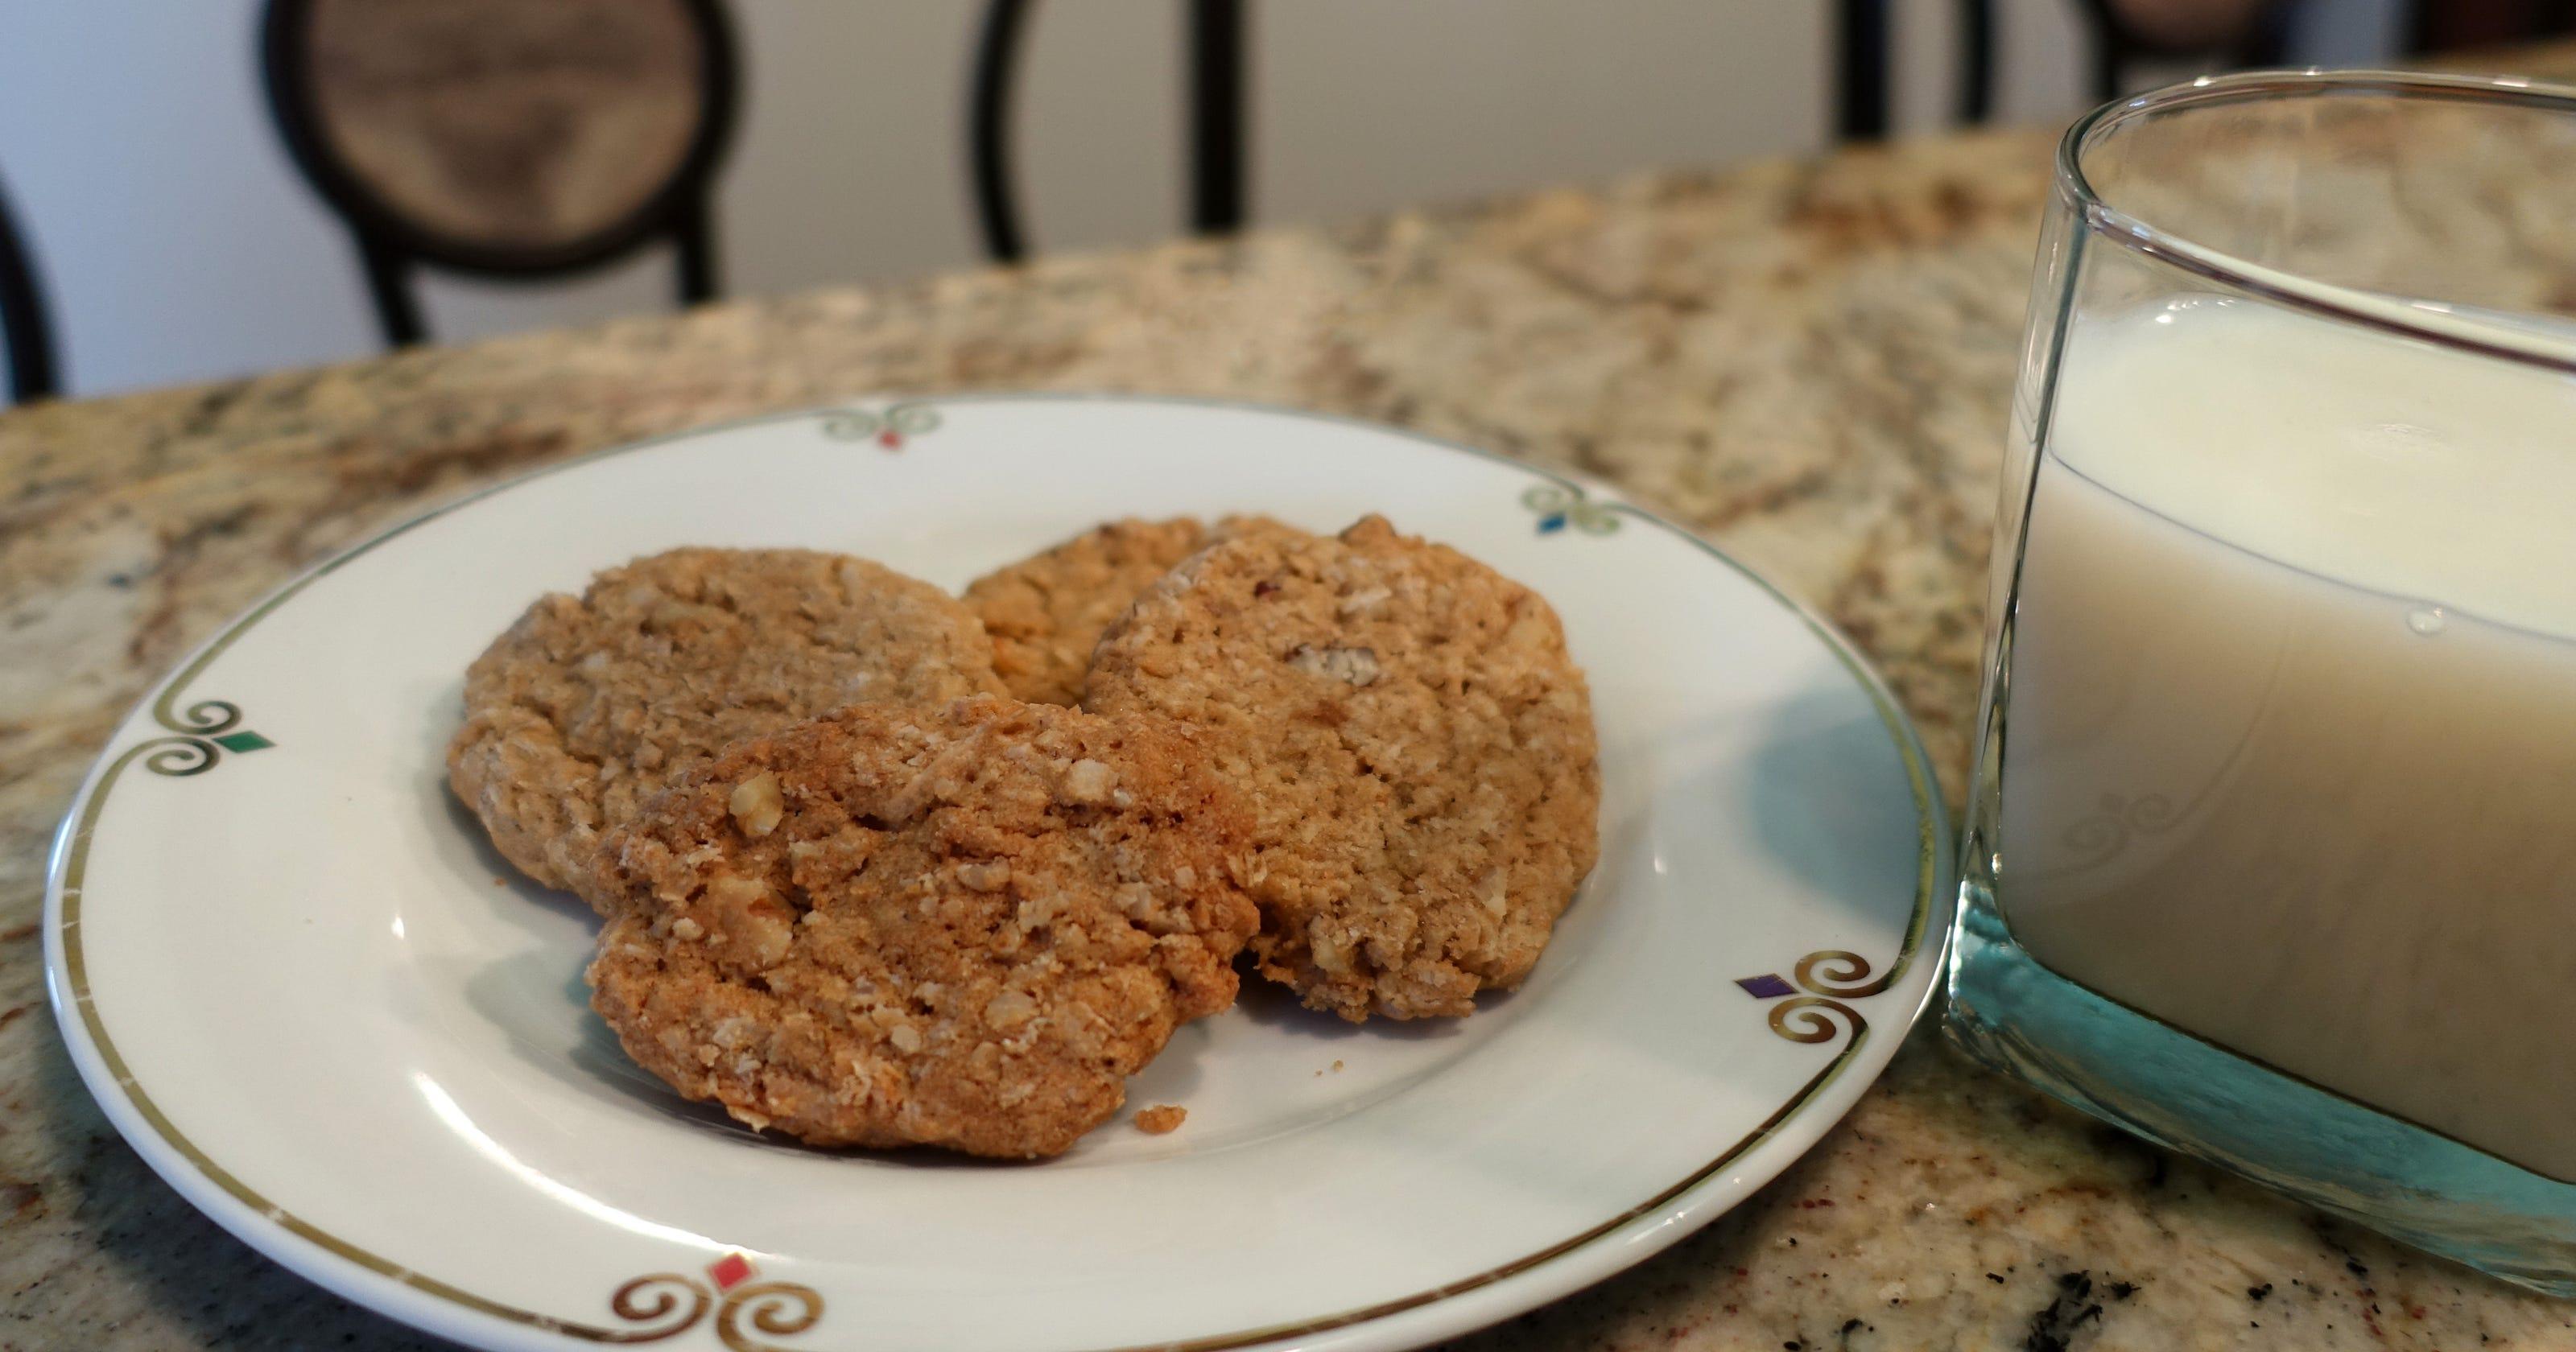 Gay S Oatmeal Icebox Cookies